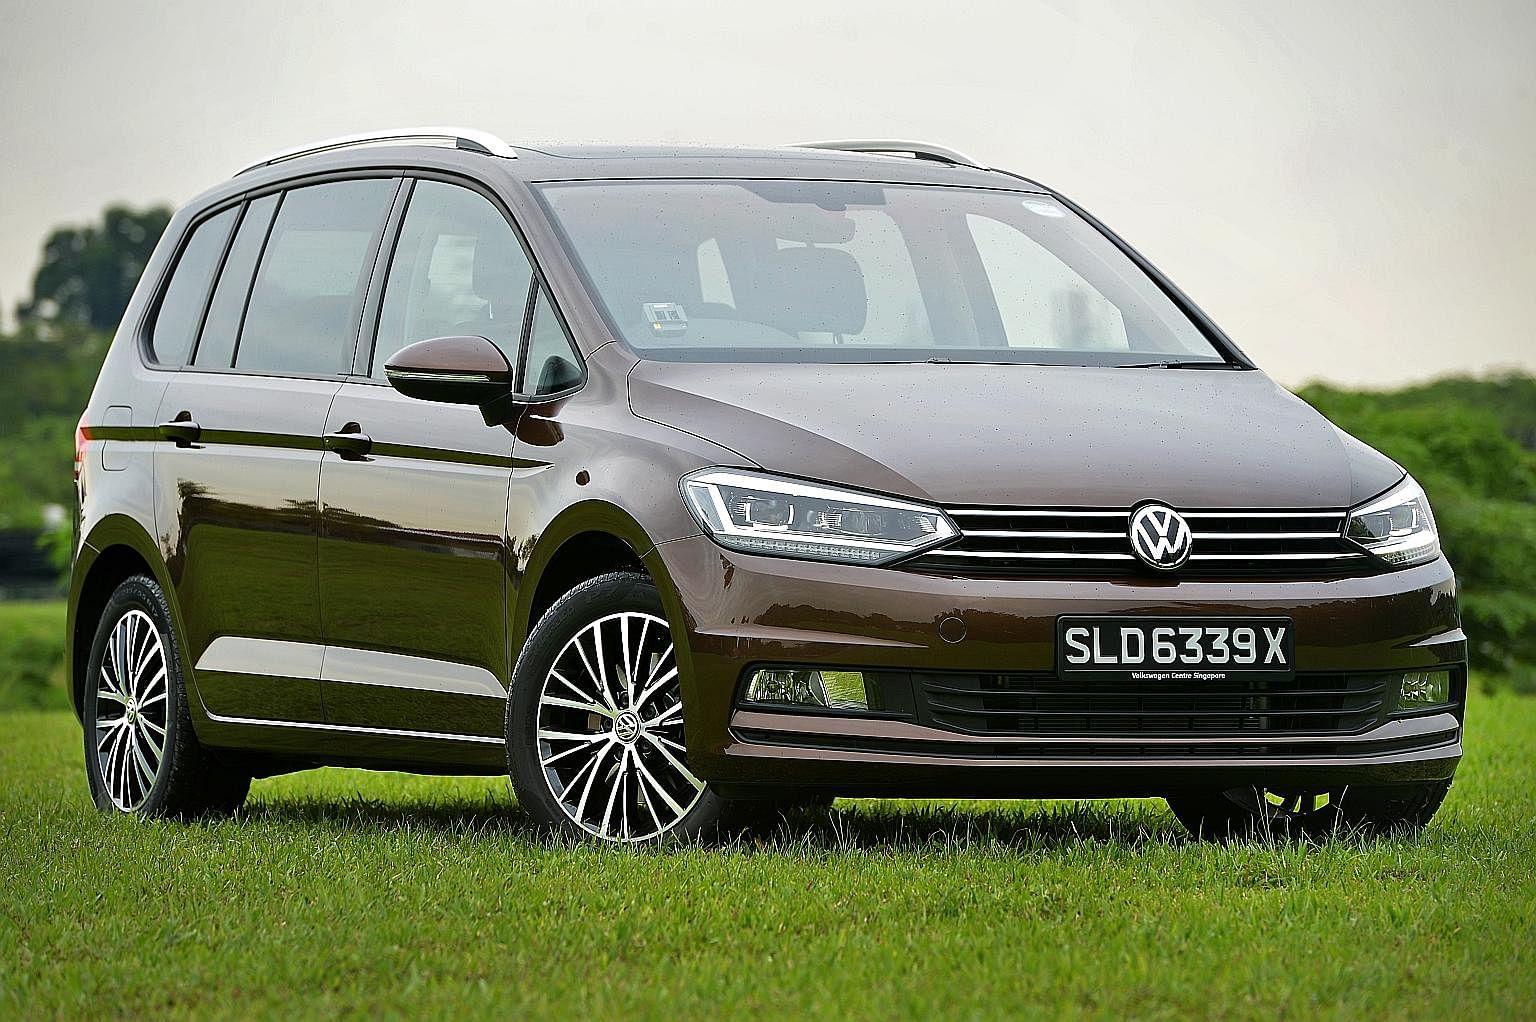 Toyota Wish, Volkswagen Touran, Volvo V90, Volkswagen Passat Variant and Renault Grand Scenic.